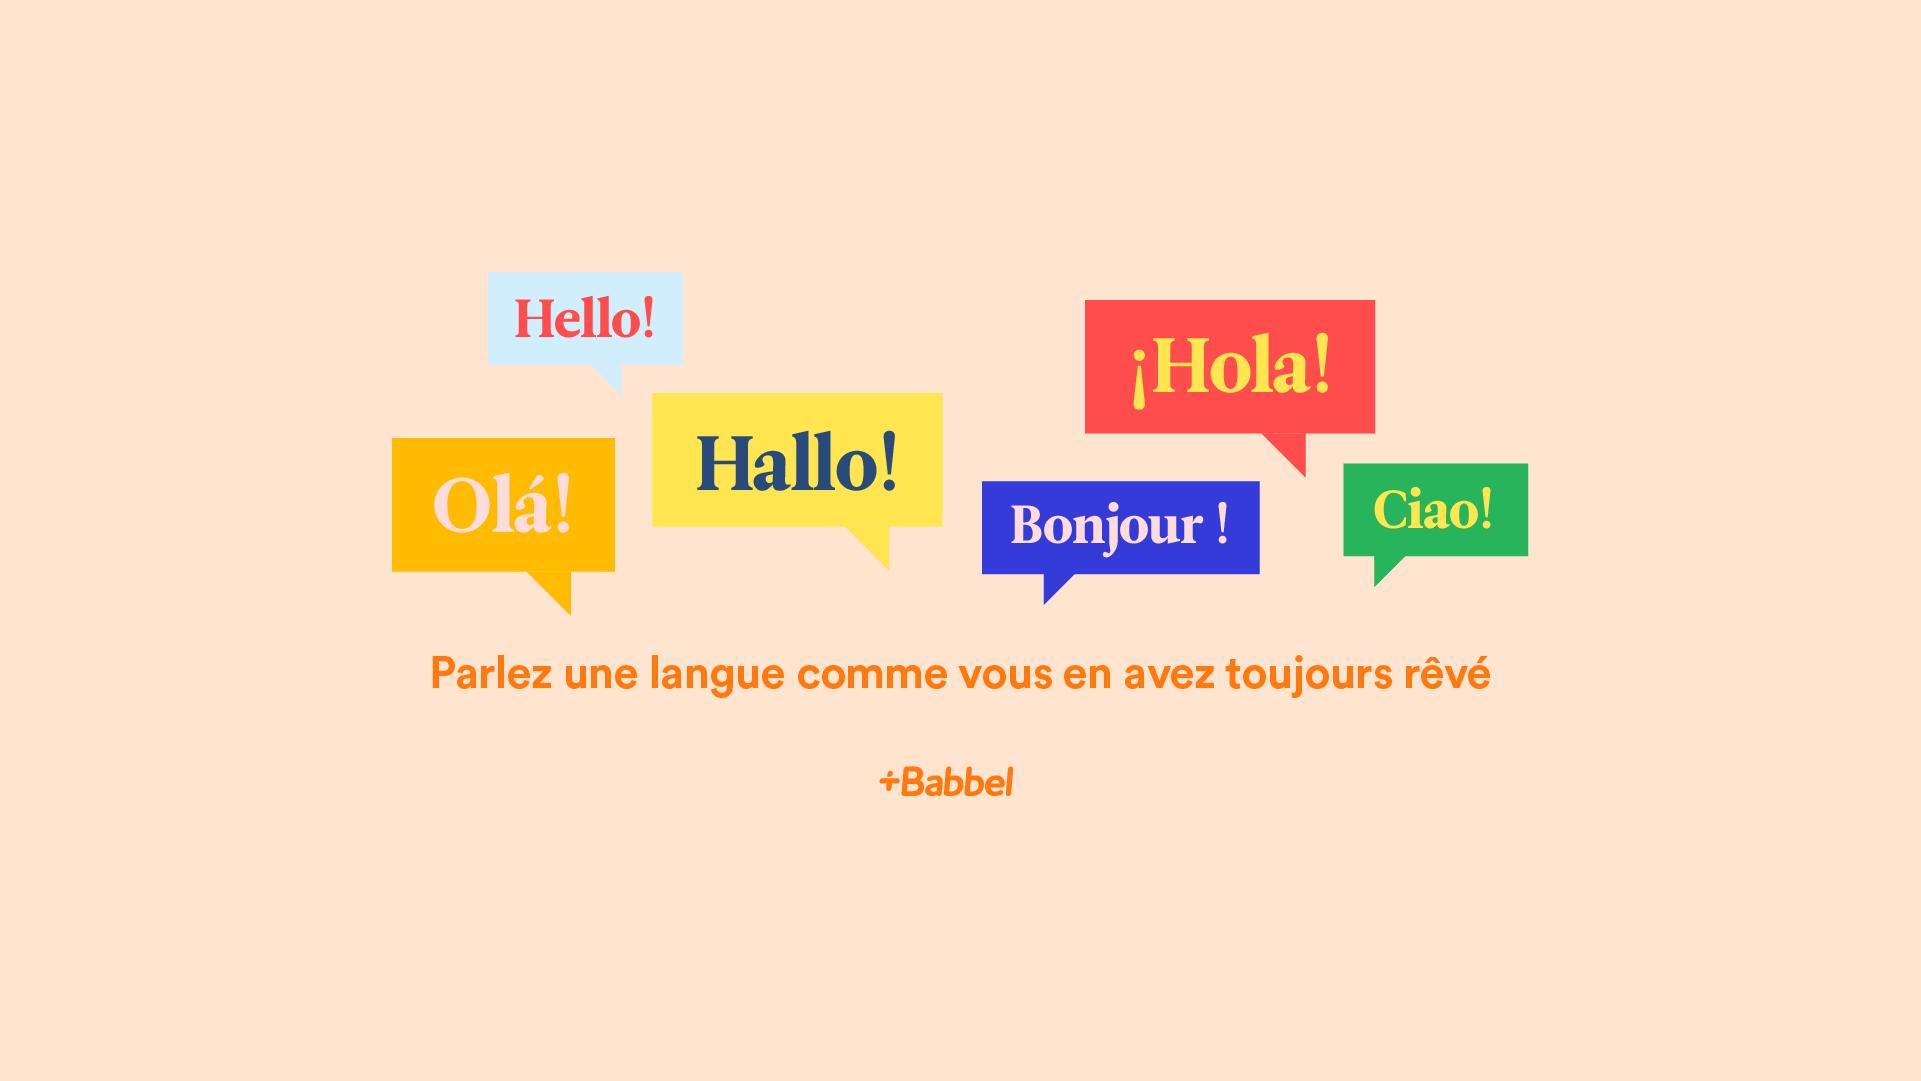 apprendre une langue  u00e9trang u00e8re en ligne avec babbel